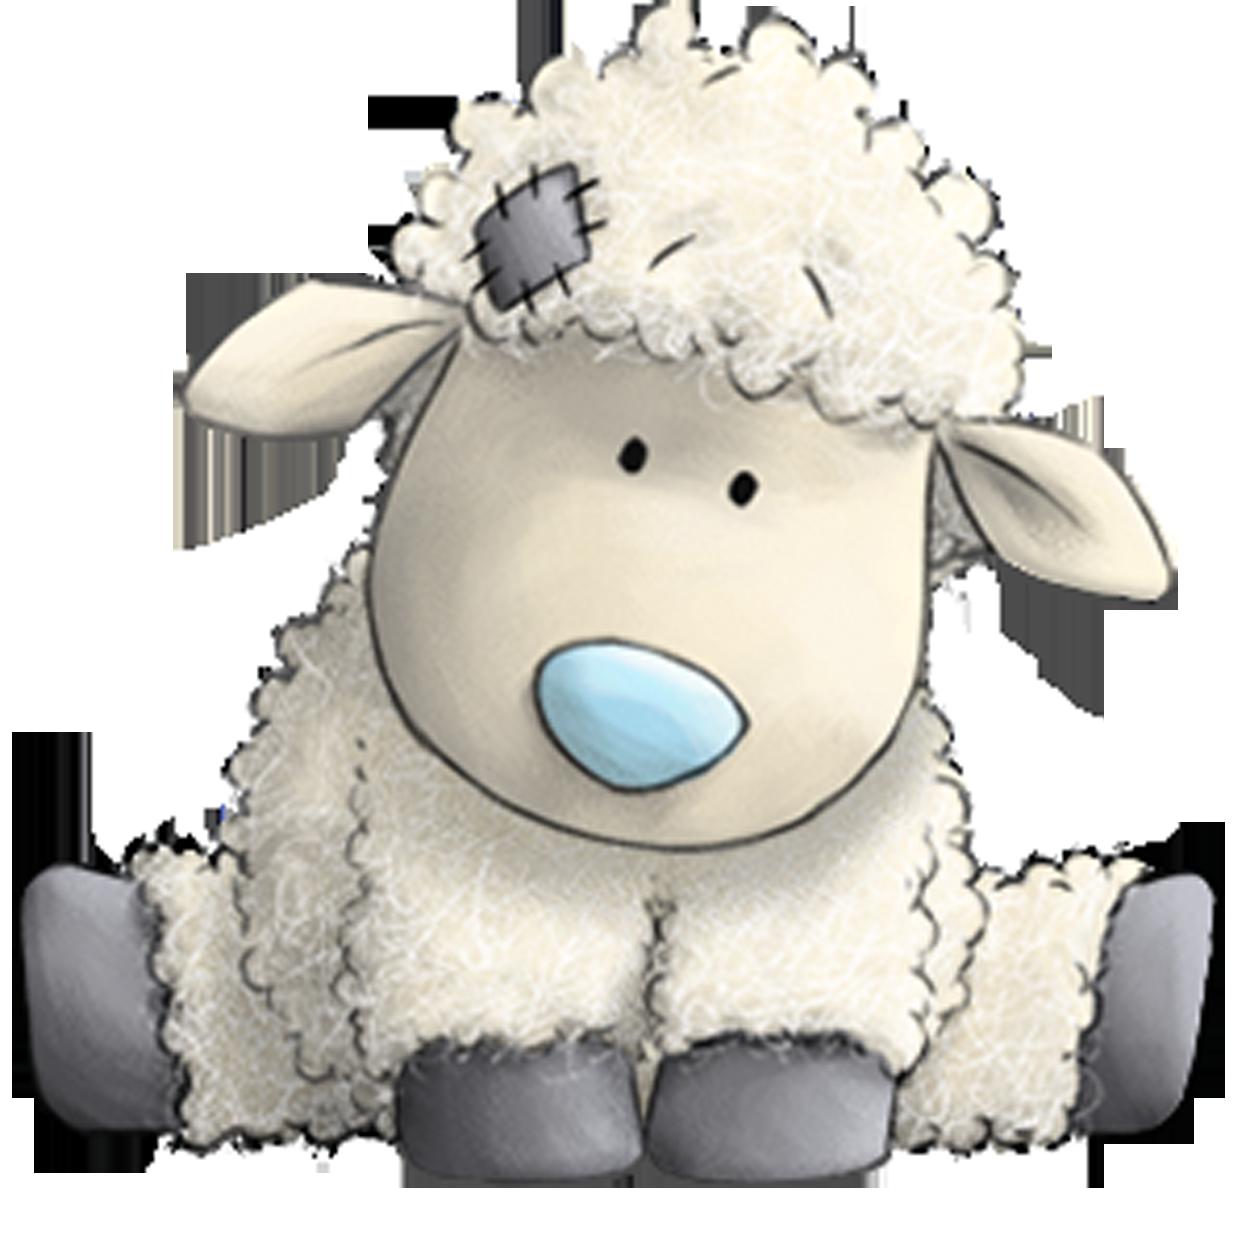 Imagenes png fondo transparente. Haircut clipart sheep